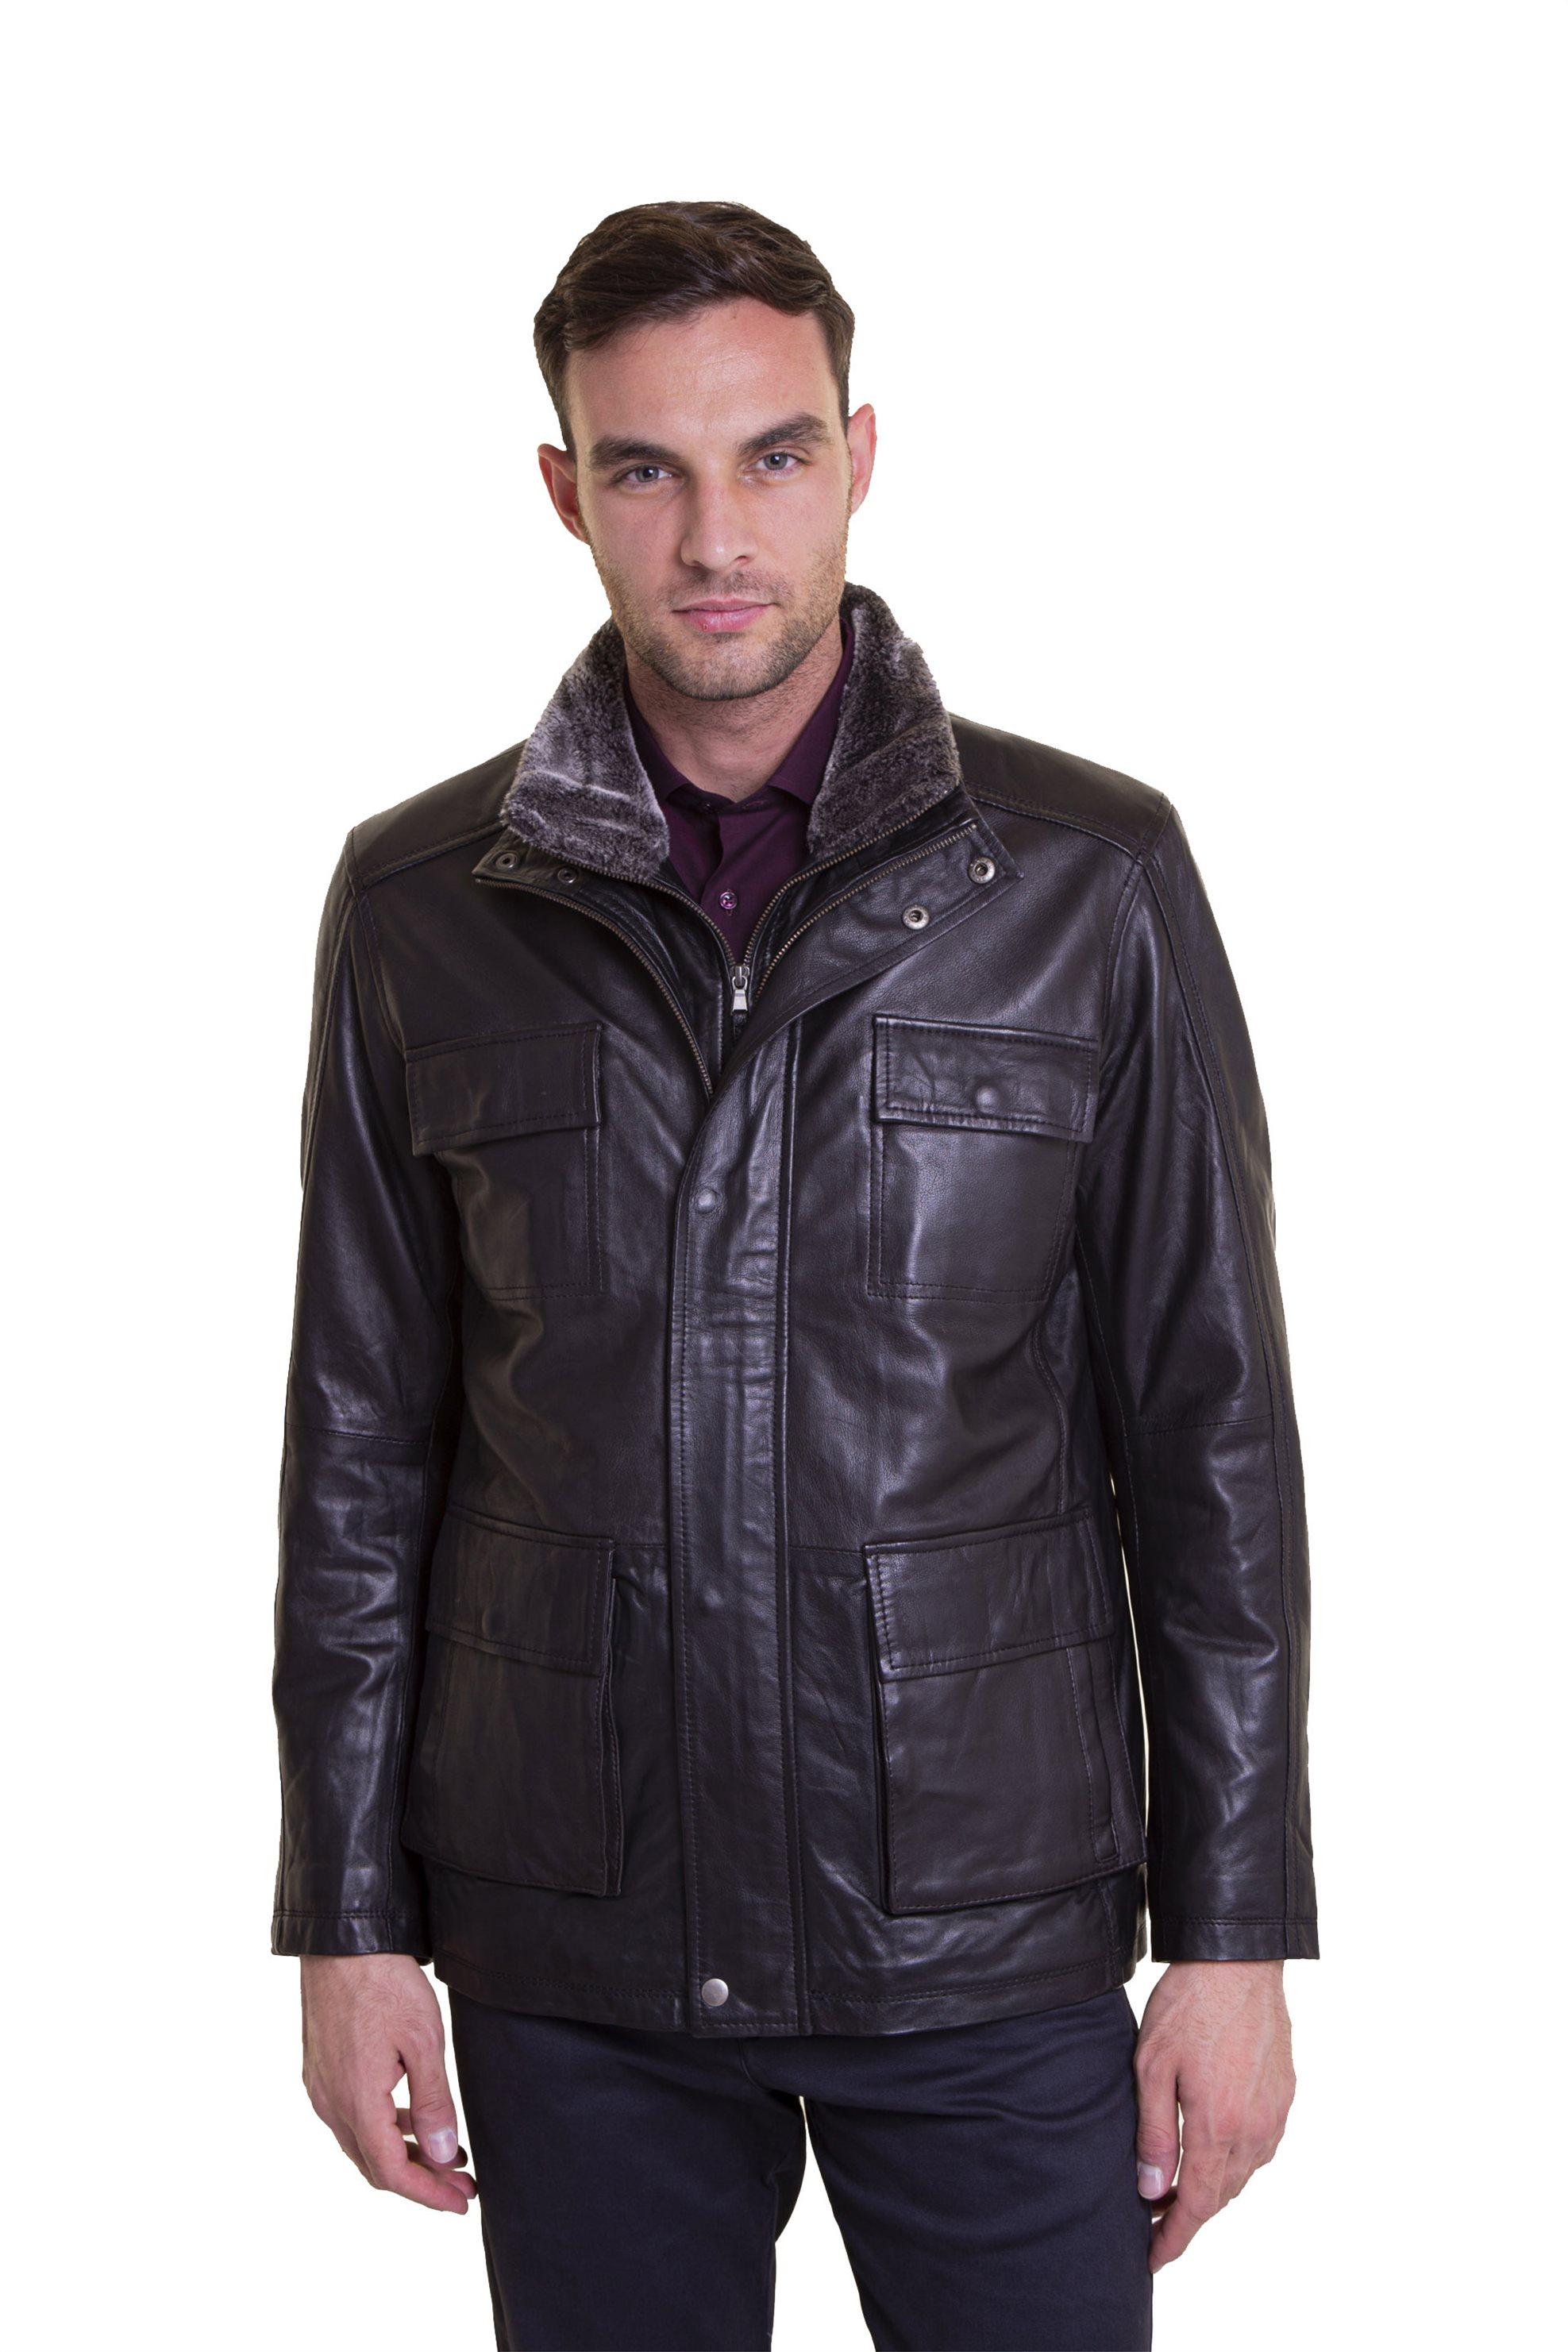 The Bostonians ανδρικό μπουφάν δερμάτινο με φερμουάρ - WL00201 - Μαύρο ανδρασ   ρουχα   παλτό   μπουφάν   δερμάτινα